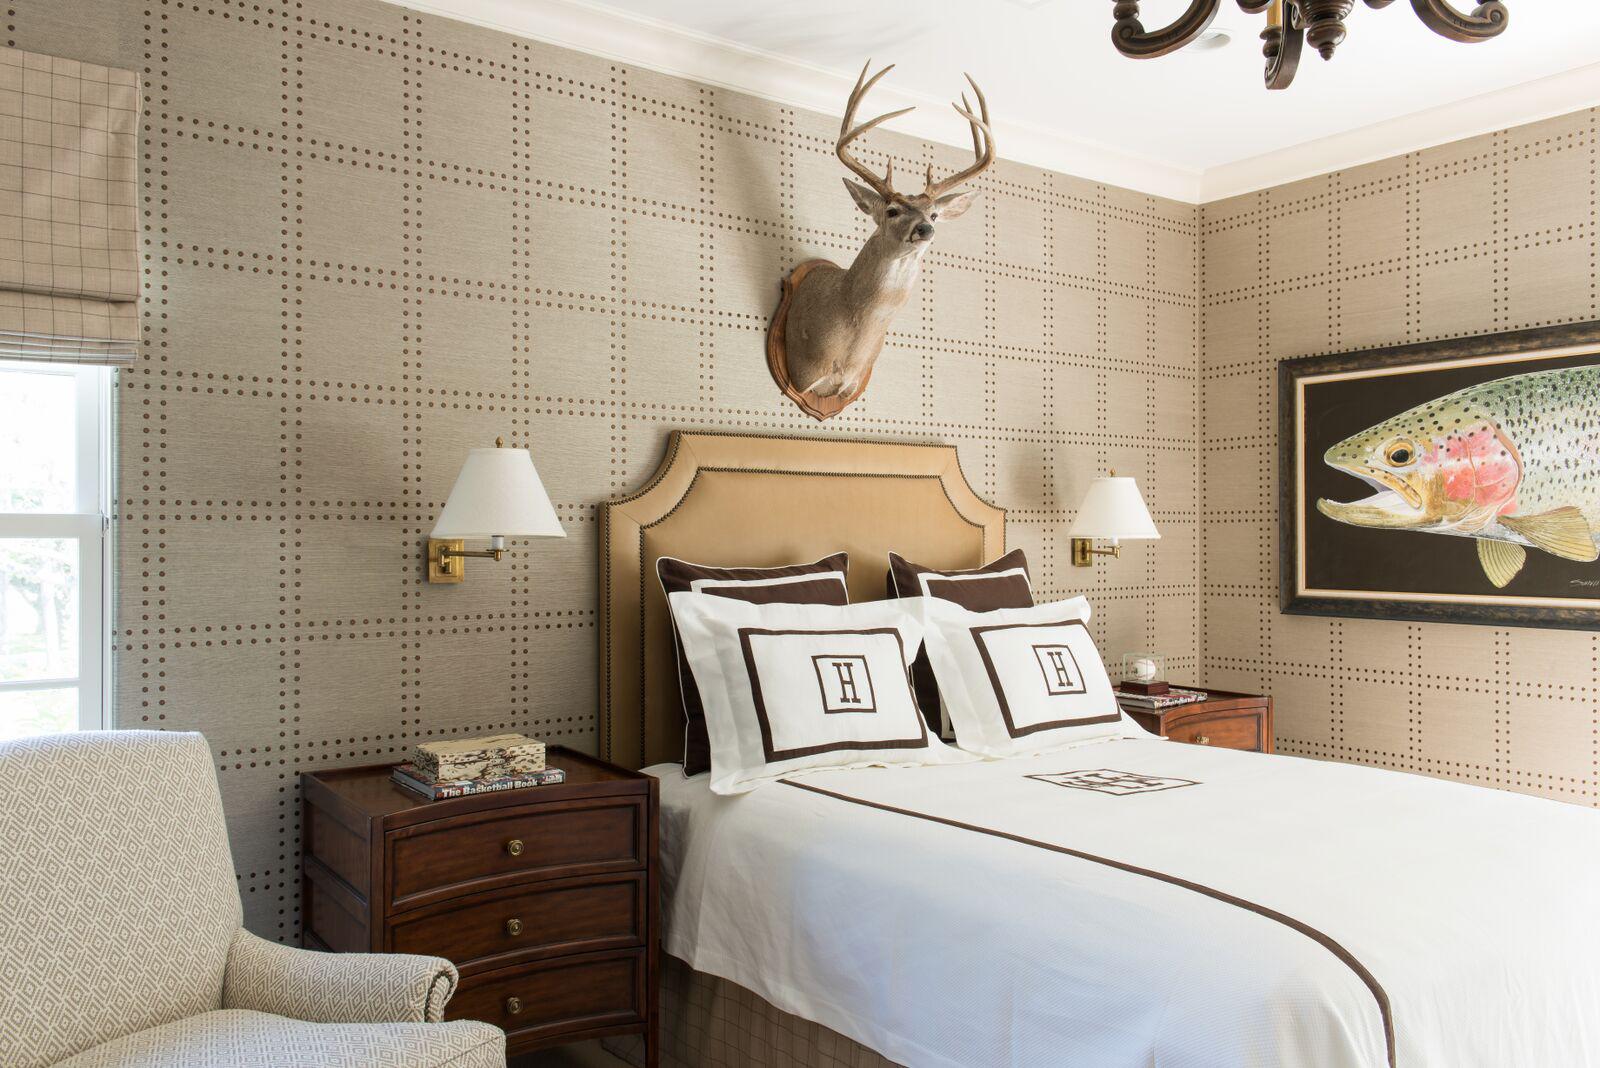 Doliver bedroom by Munger Interiors